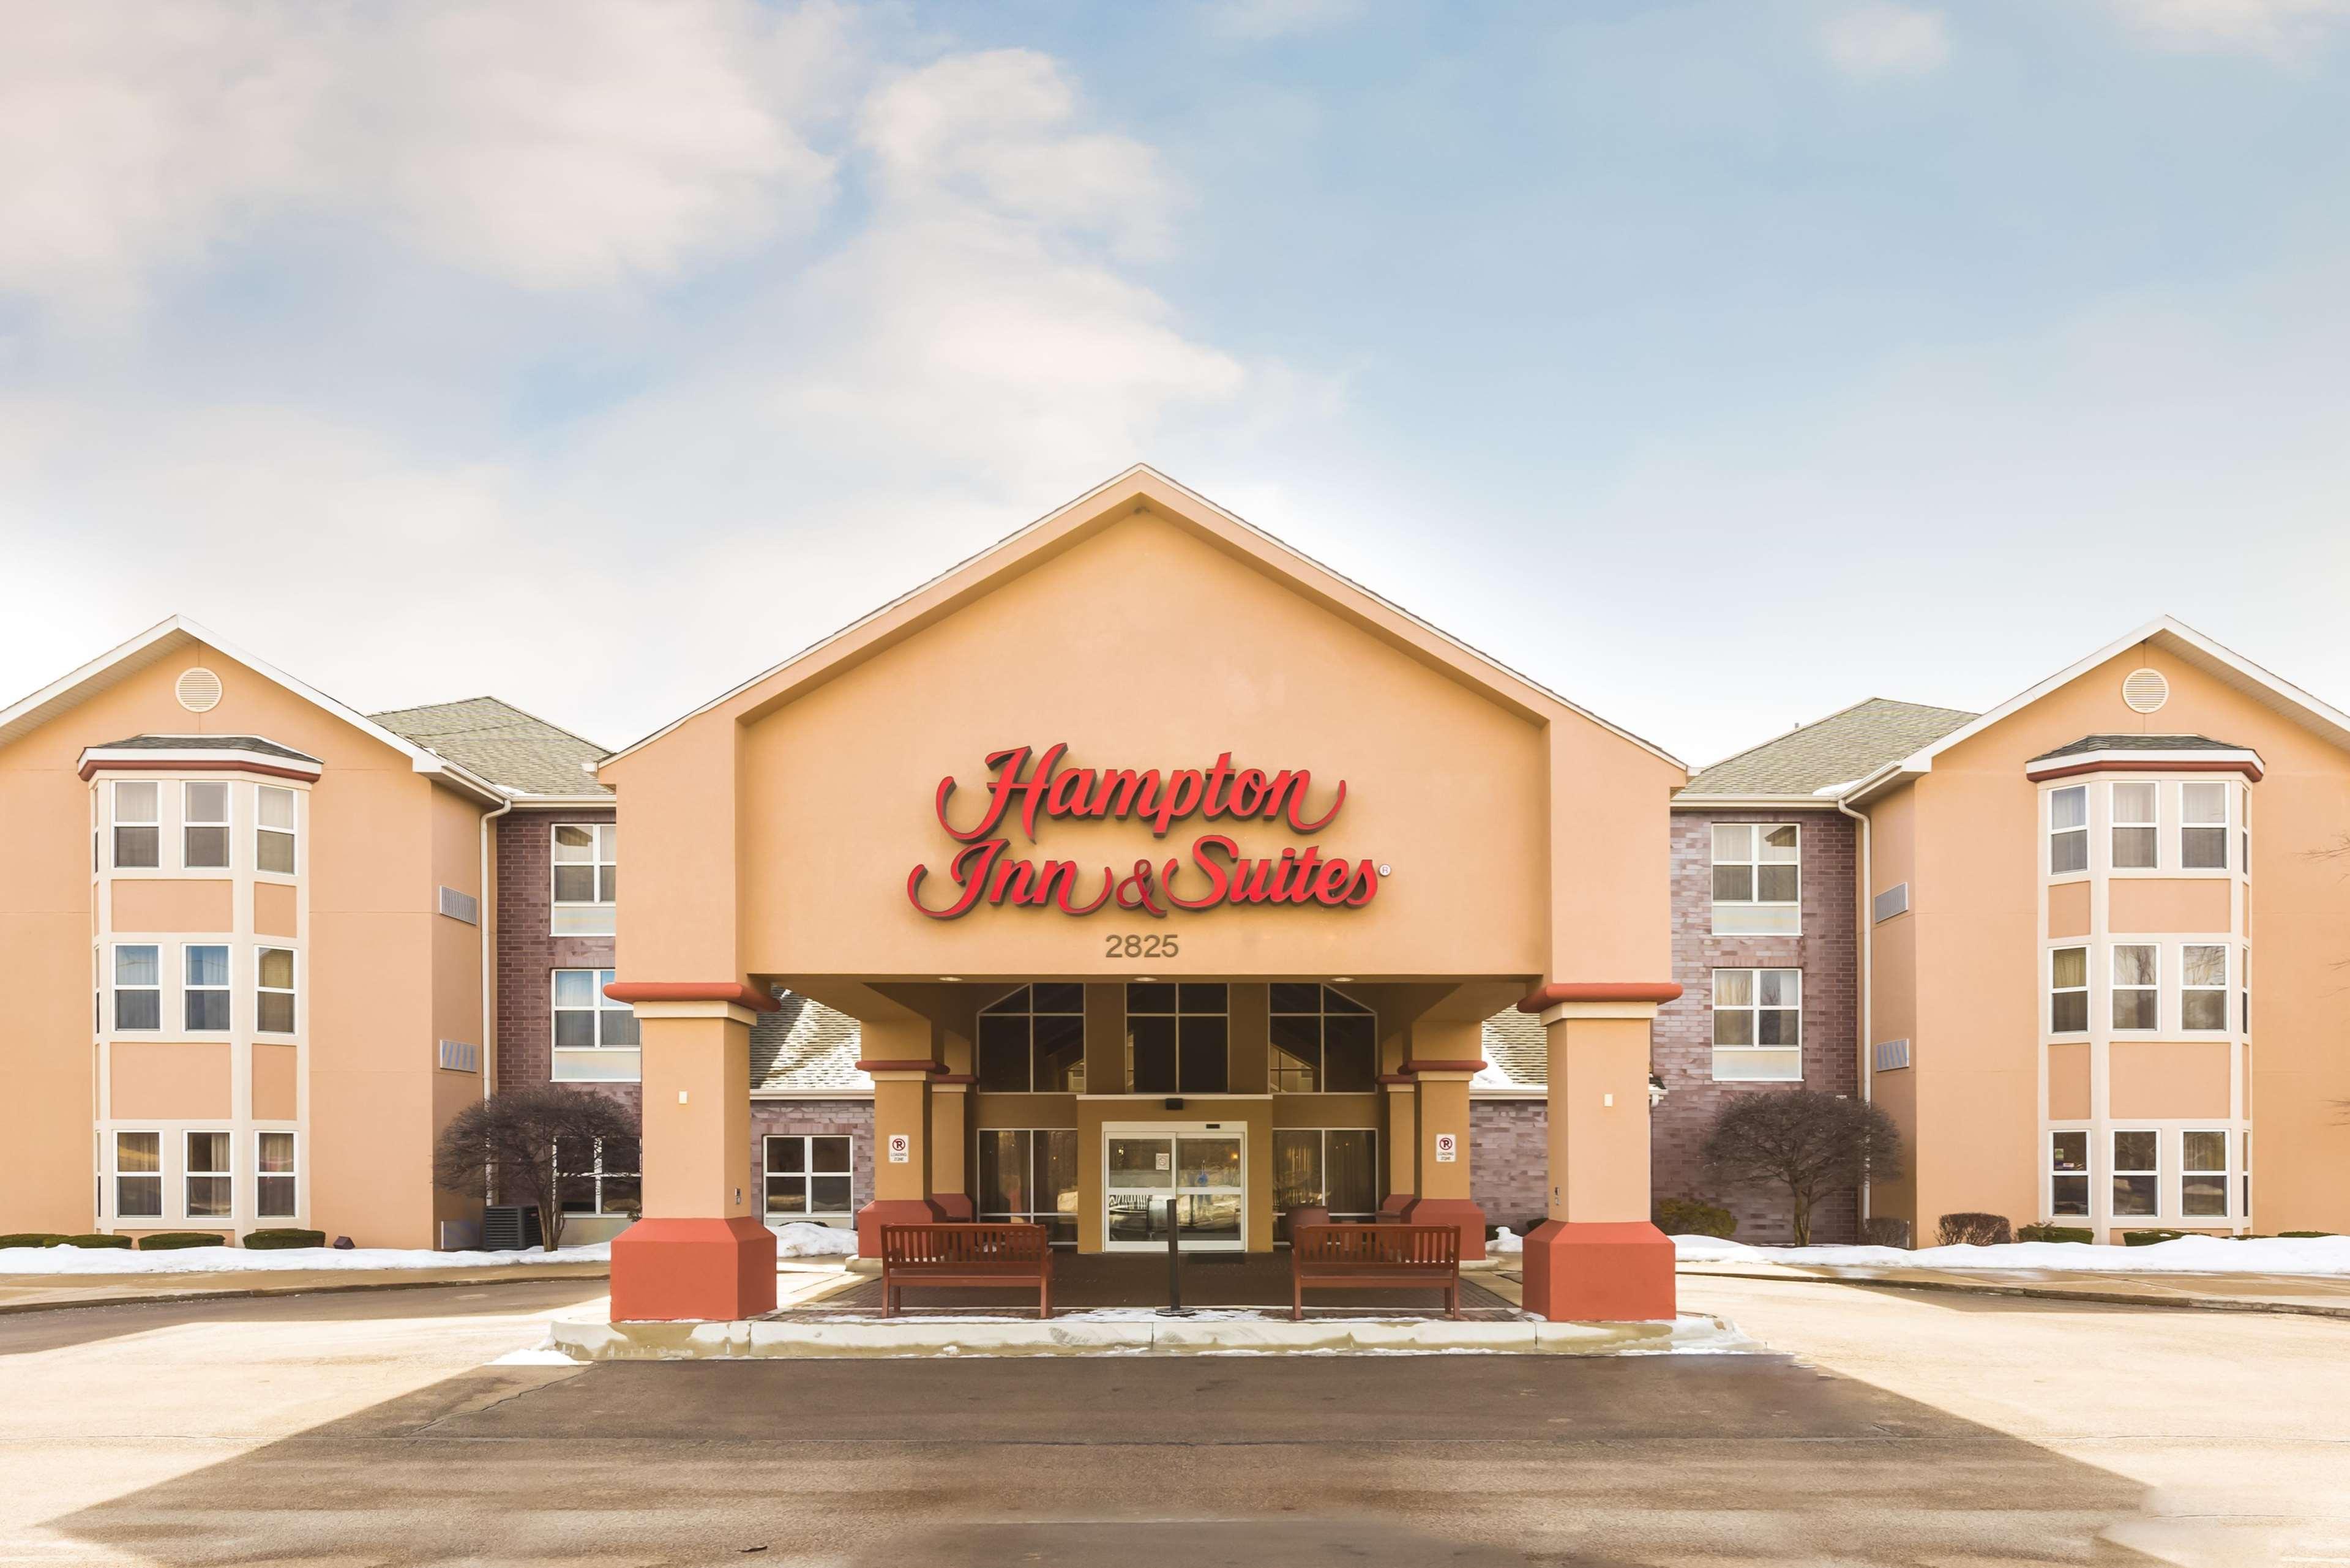 Hampton Inn & Suites Chicago/Hoffman Estates image 19